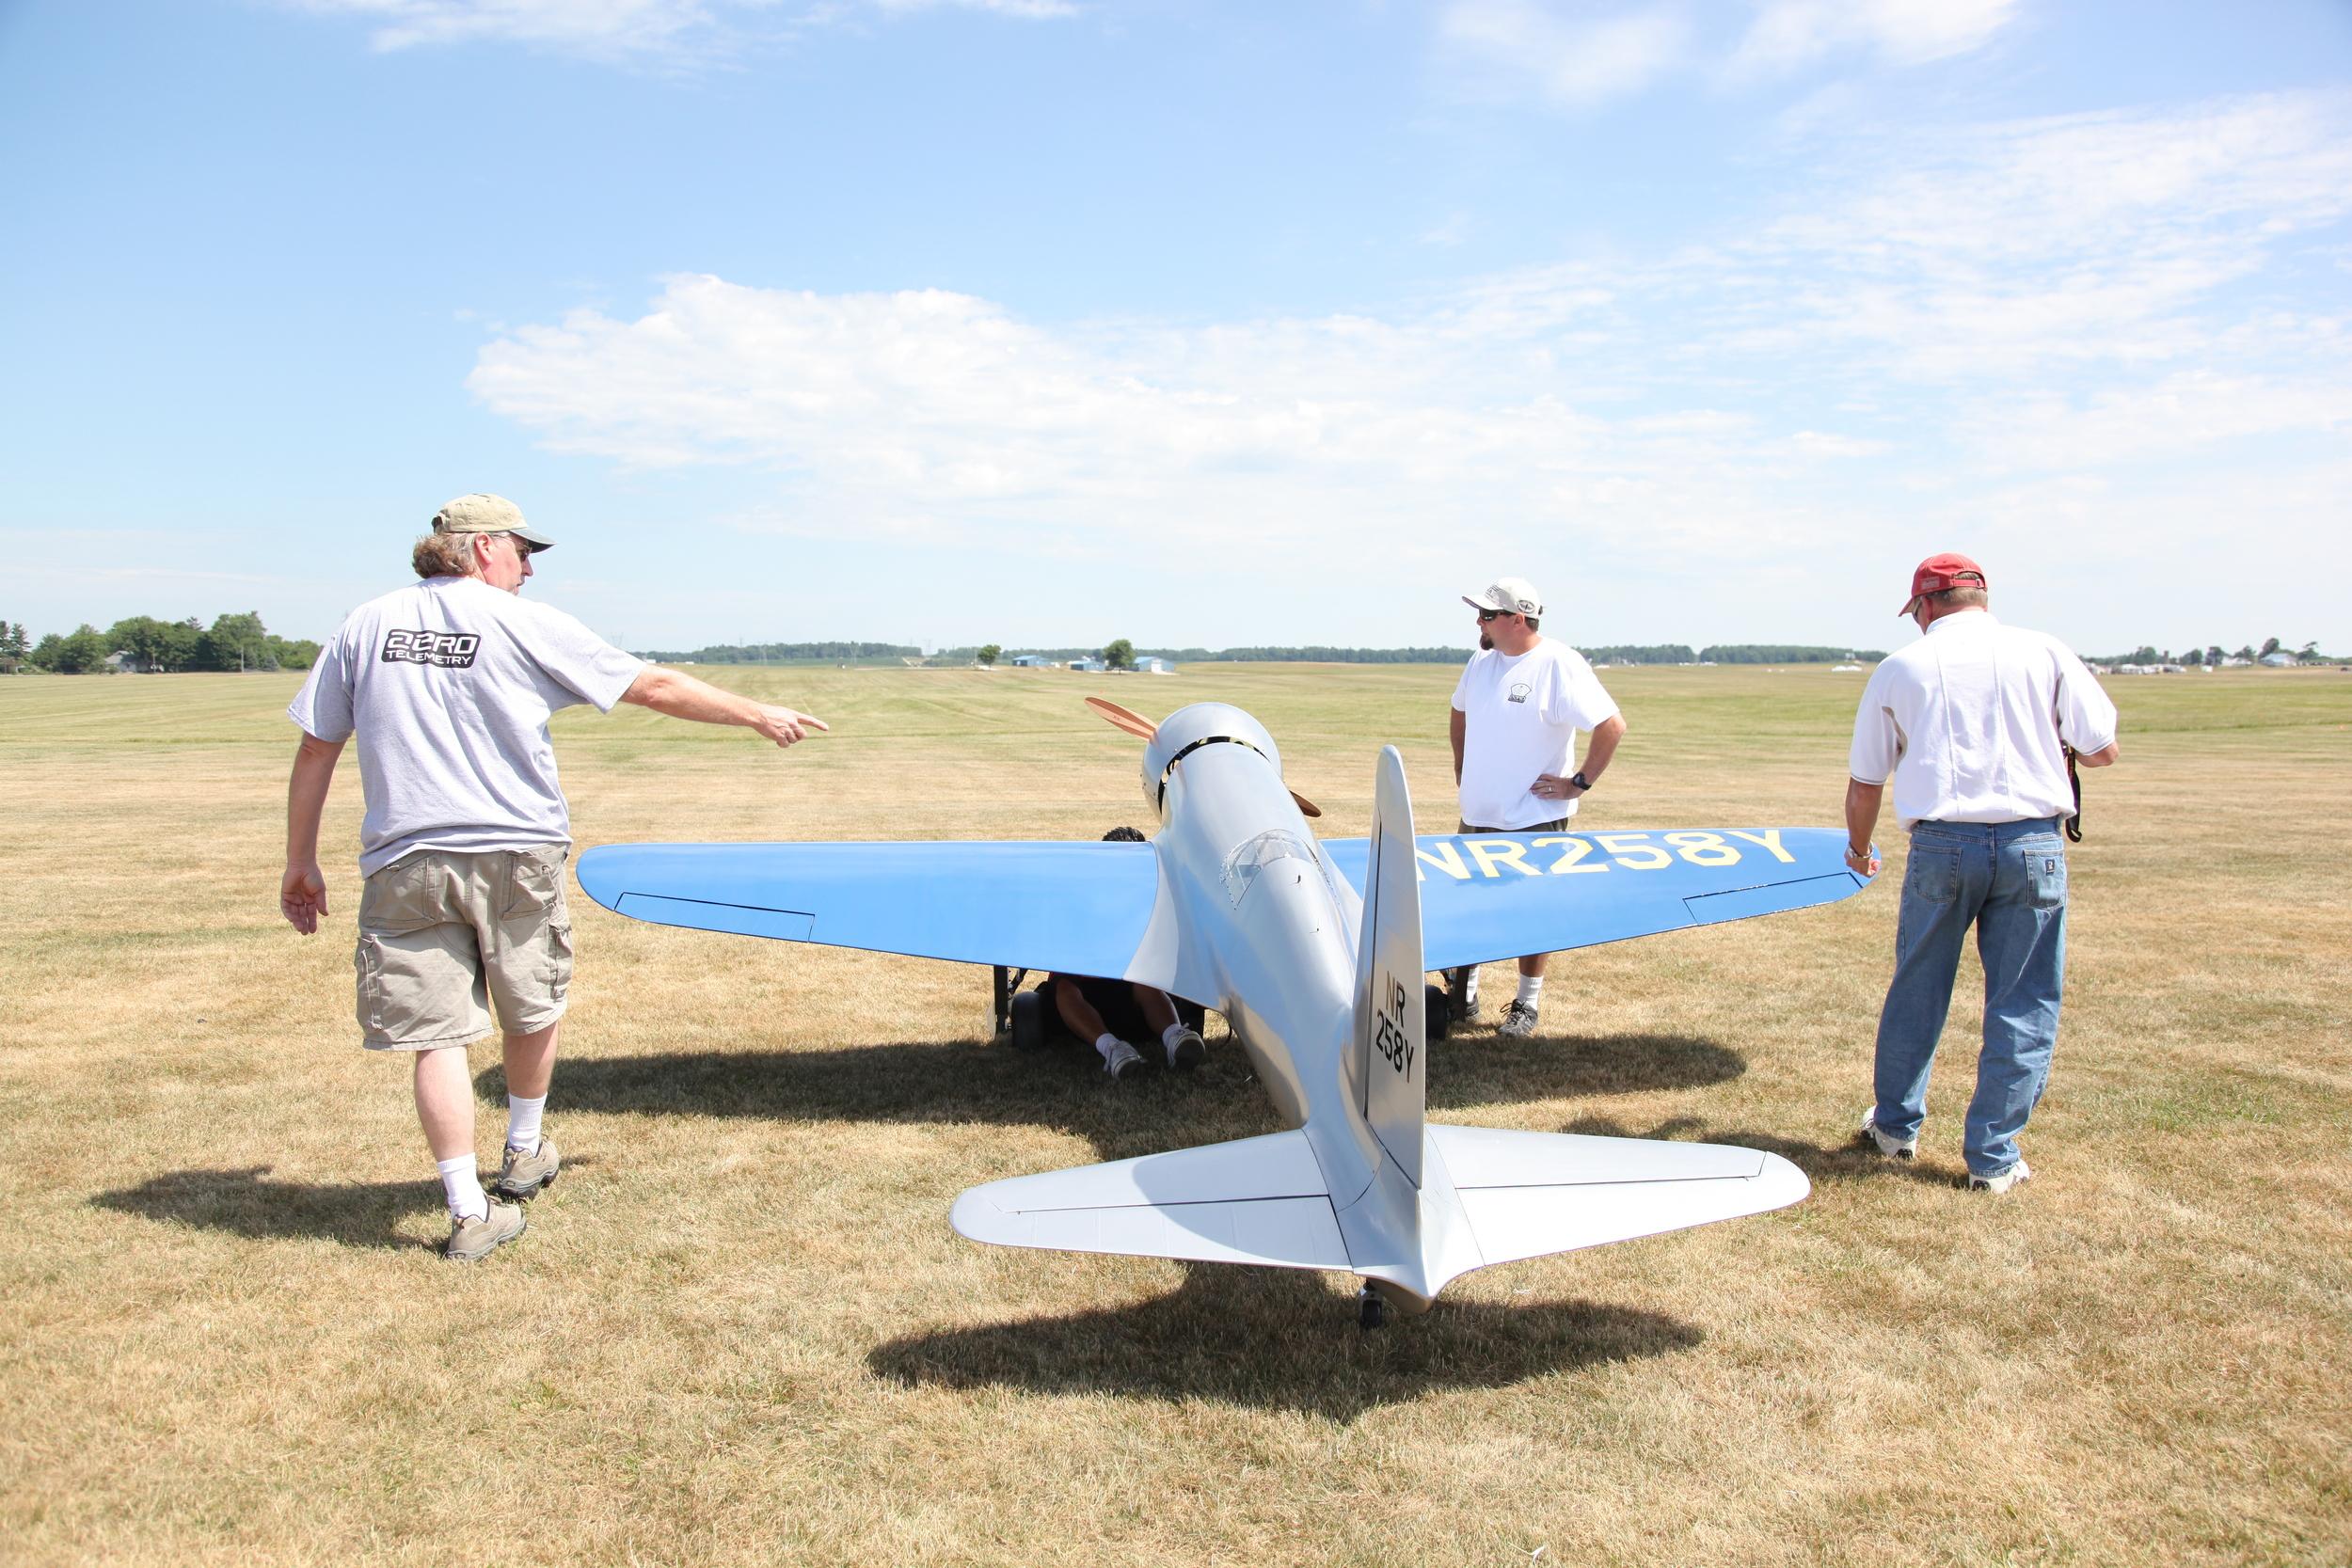 Aero H1 Racer flight crew